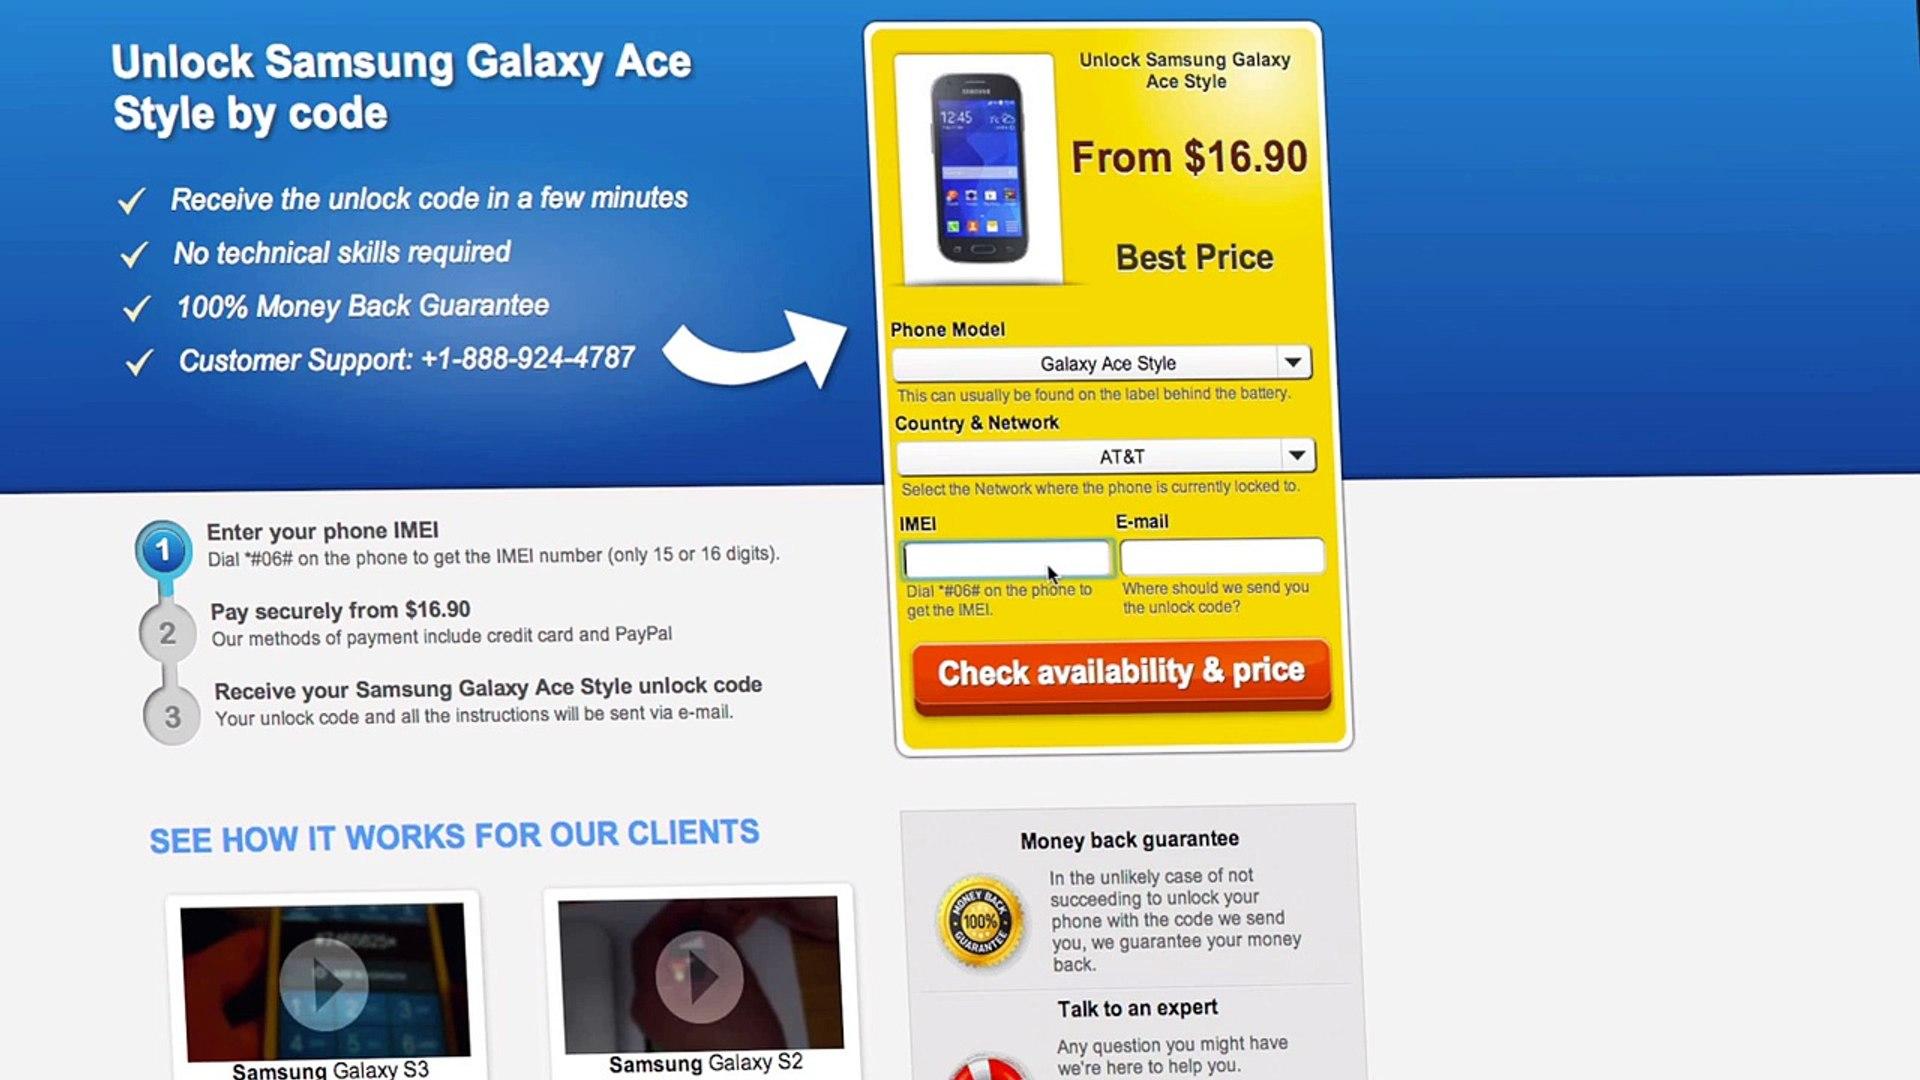 UNLOCK Samsung Galaxy Ace Style - HOW TO UNLOCK YOUR Samsung Galaxy Ace Style